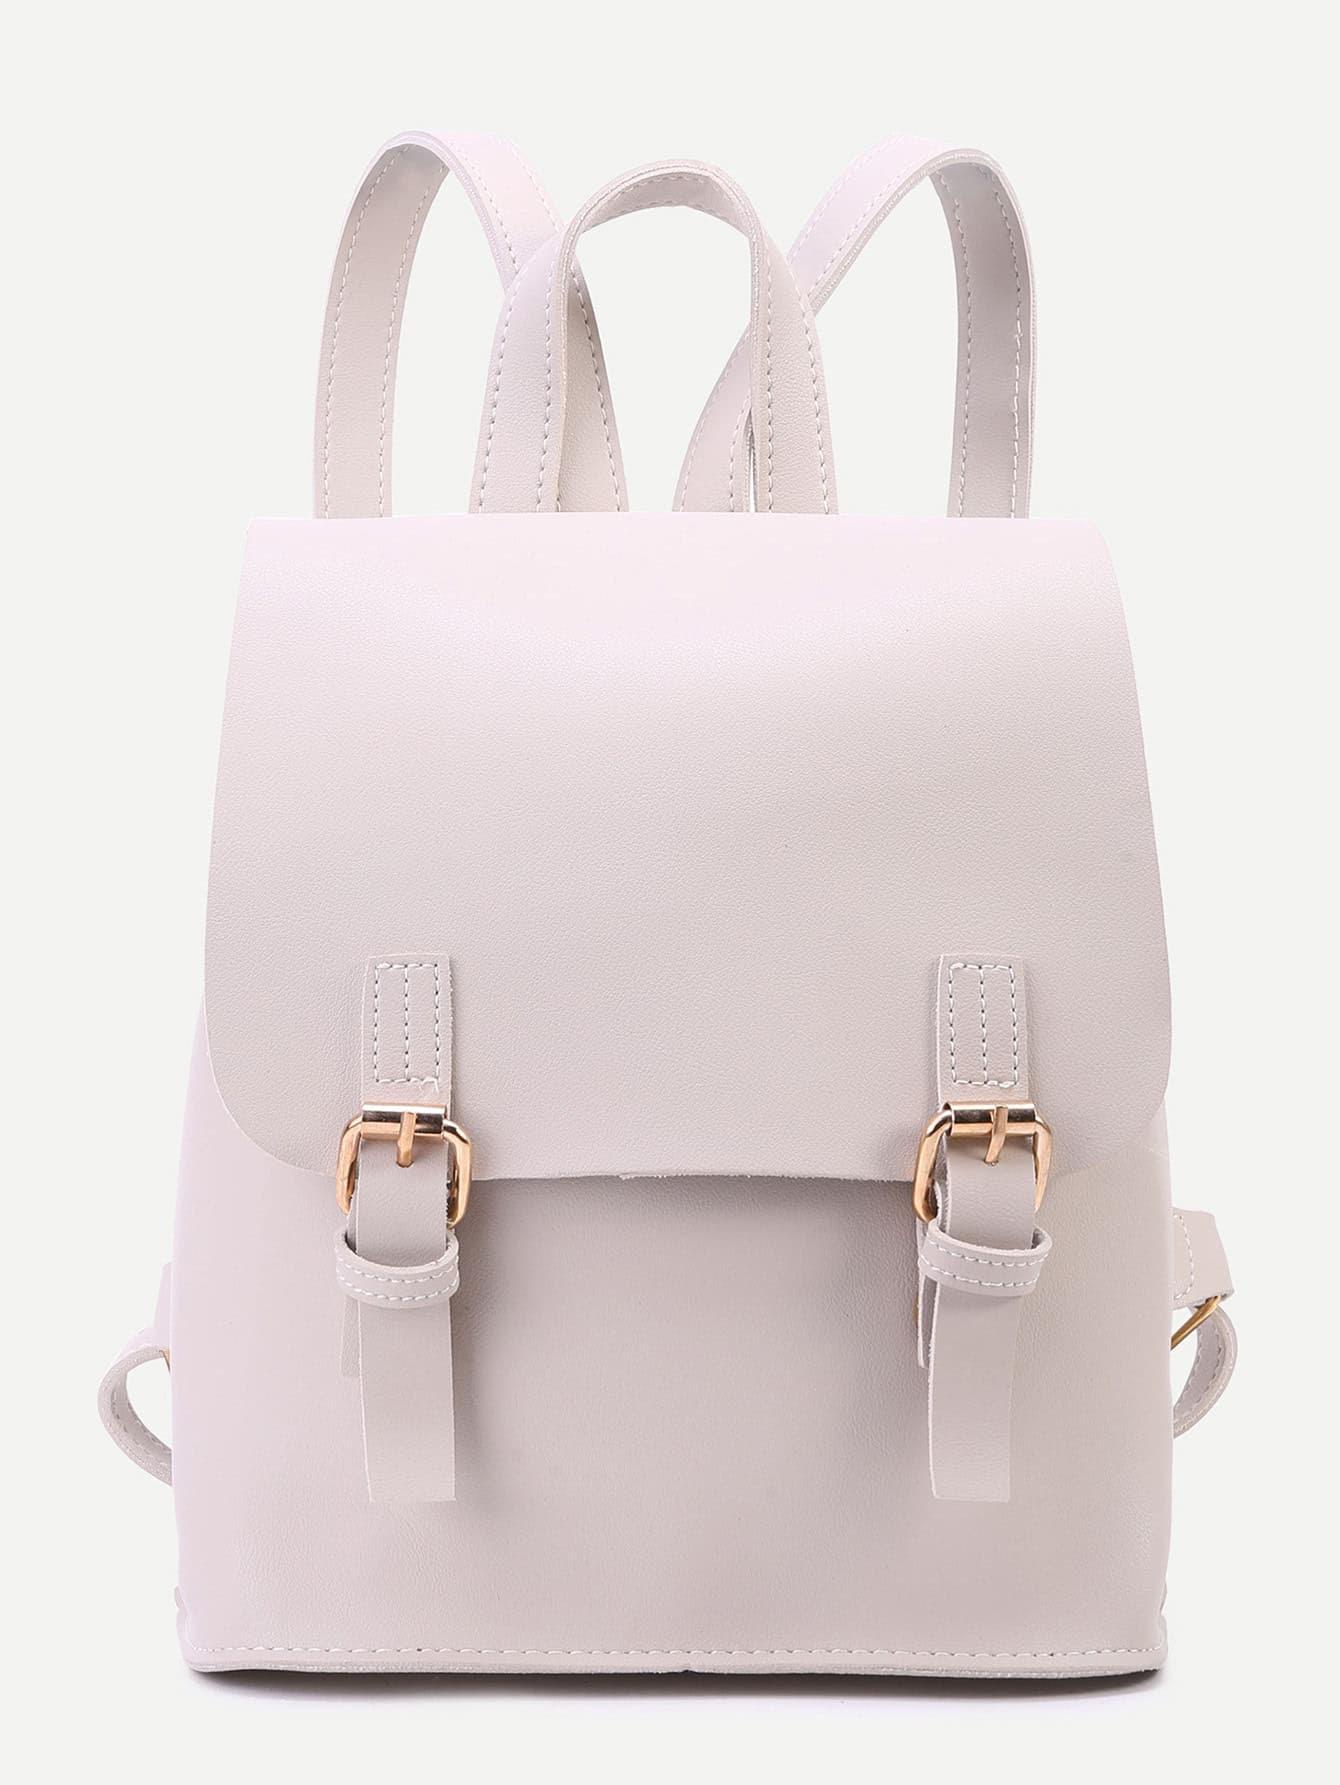 bag160919907_2